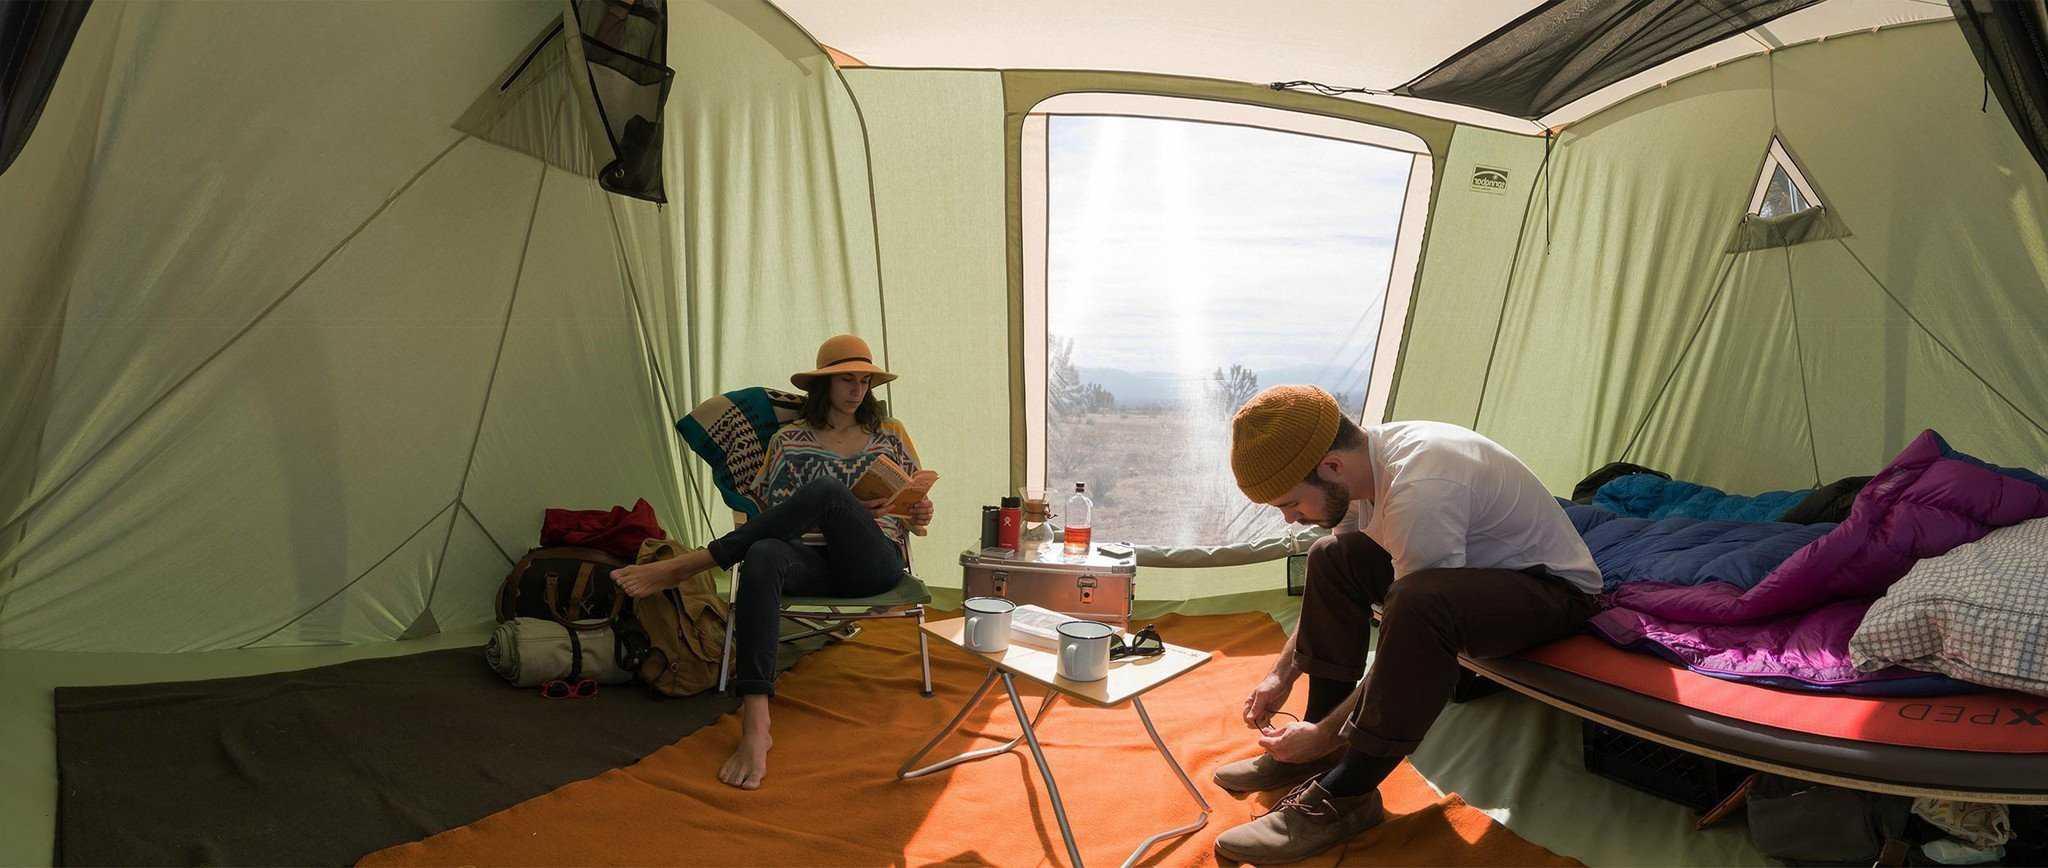 Springbar Highline Canvas Tent Interior